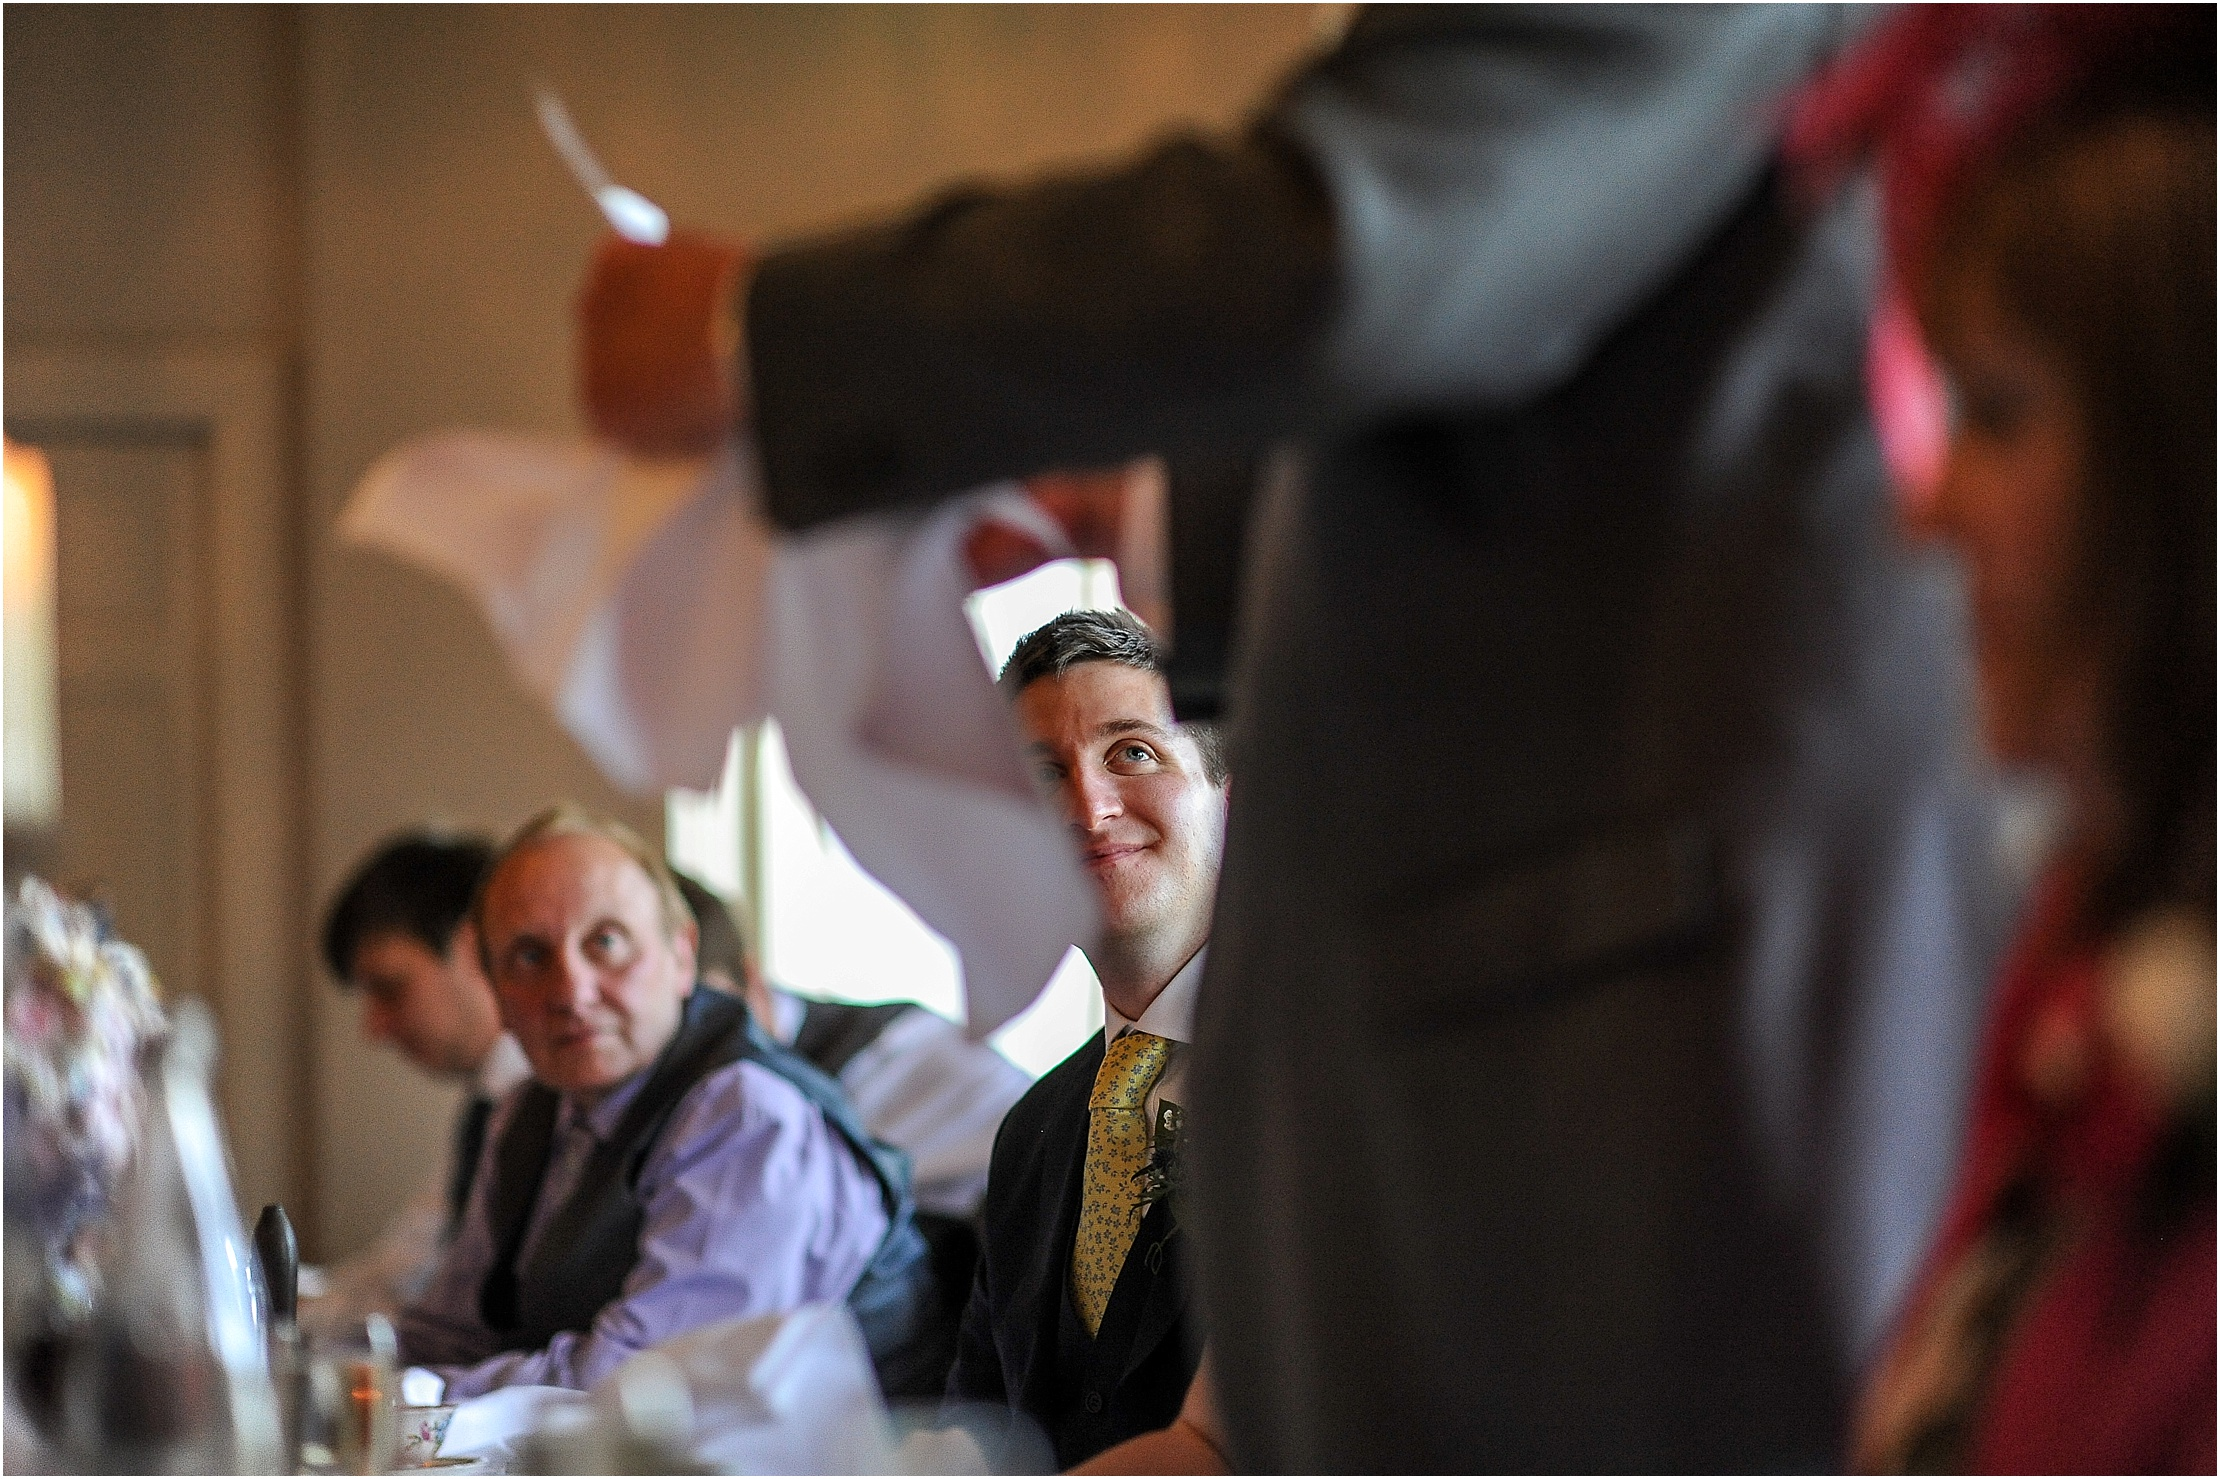 shireburn-arms-wedding- 101.jpg